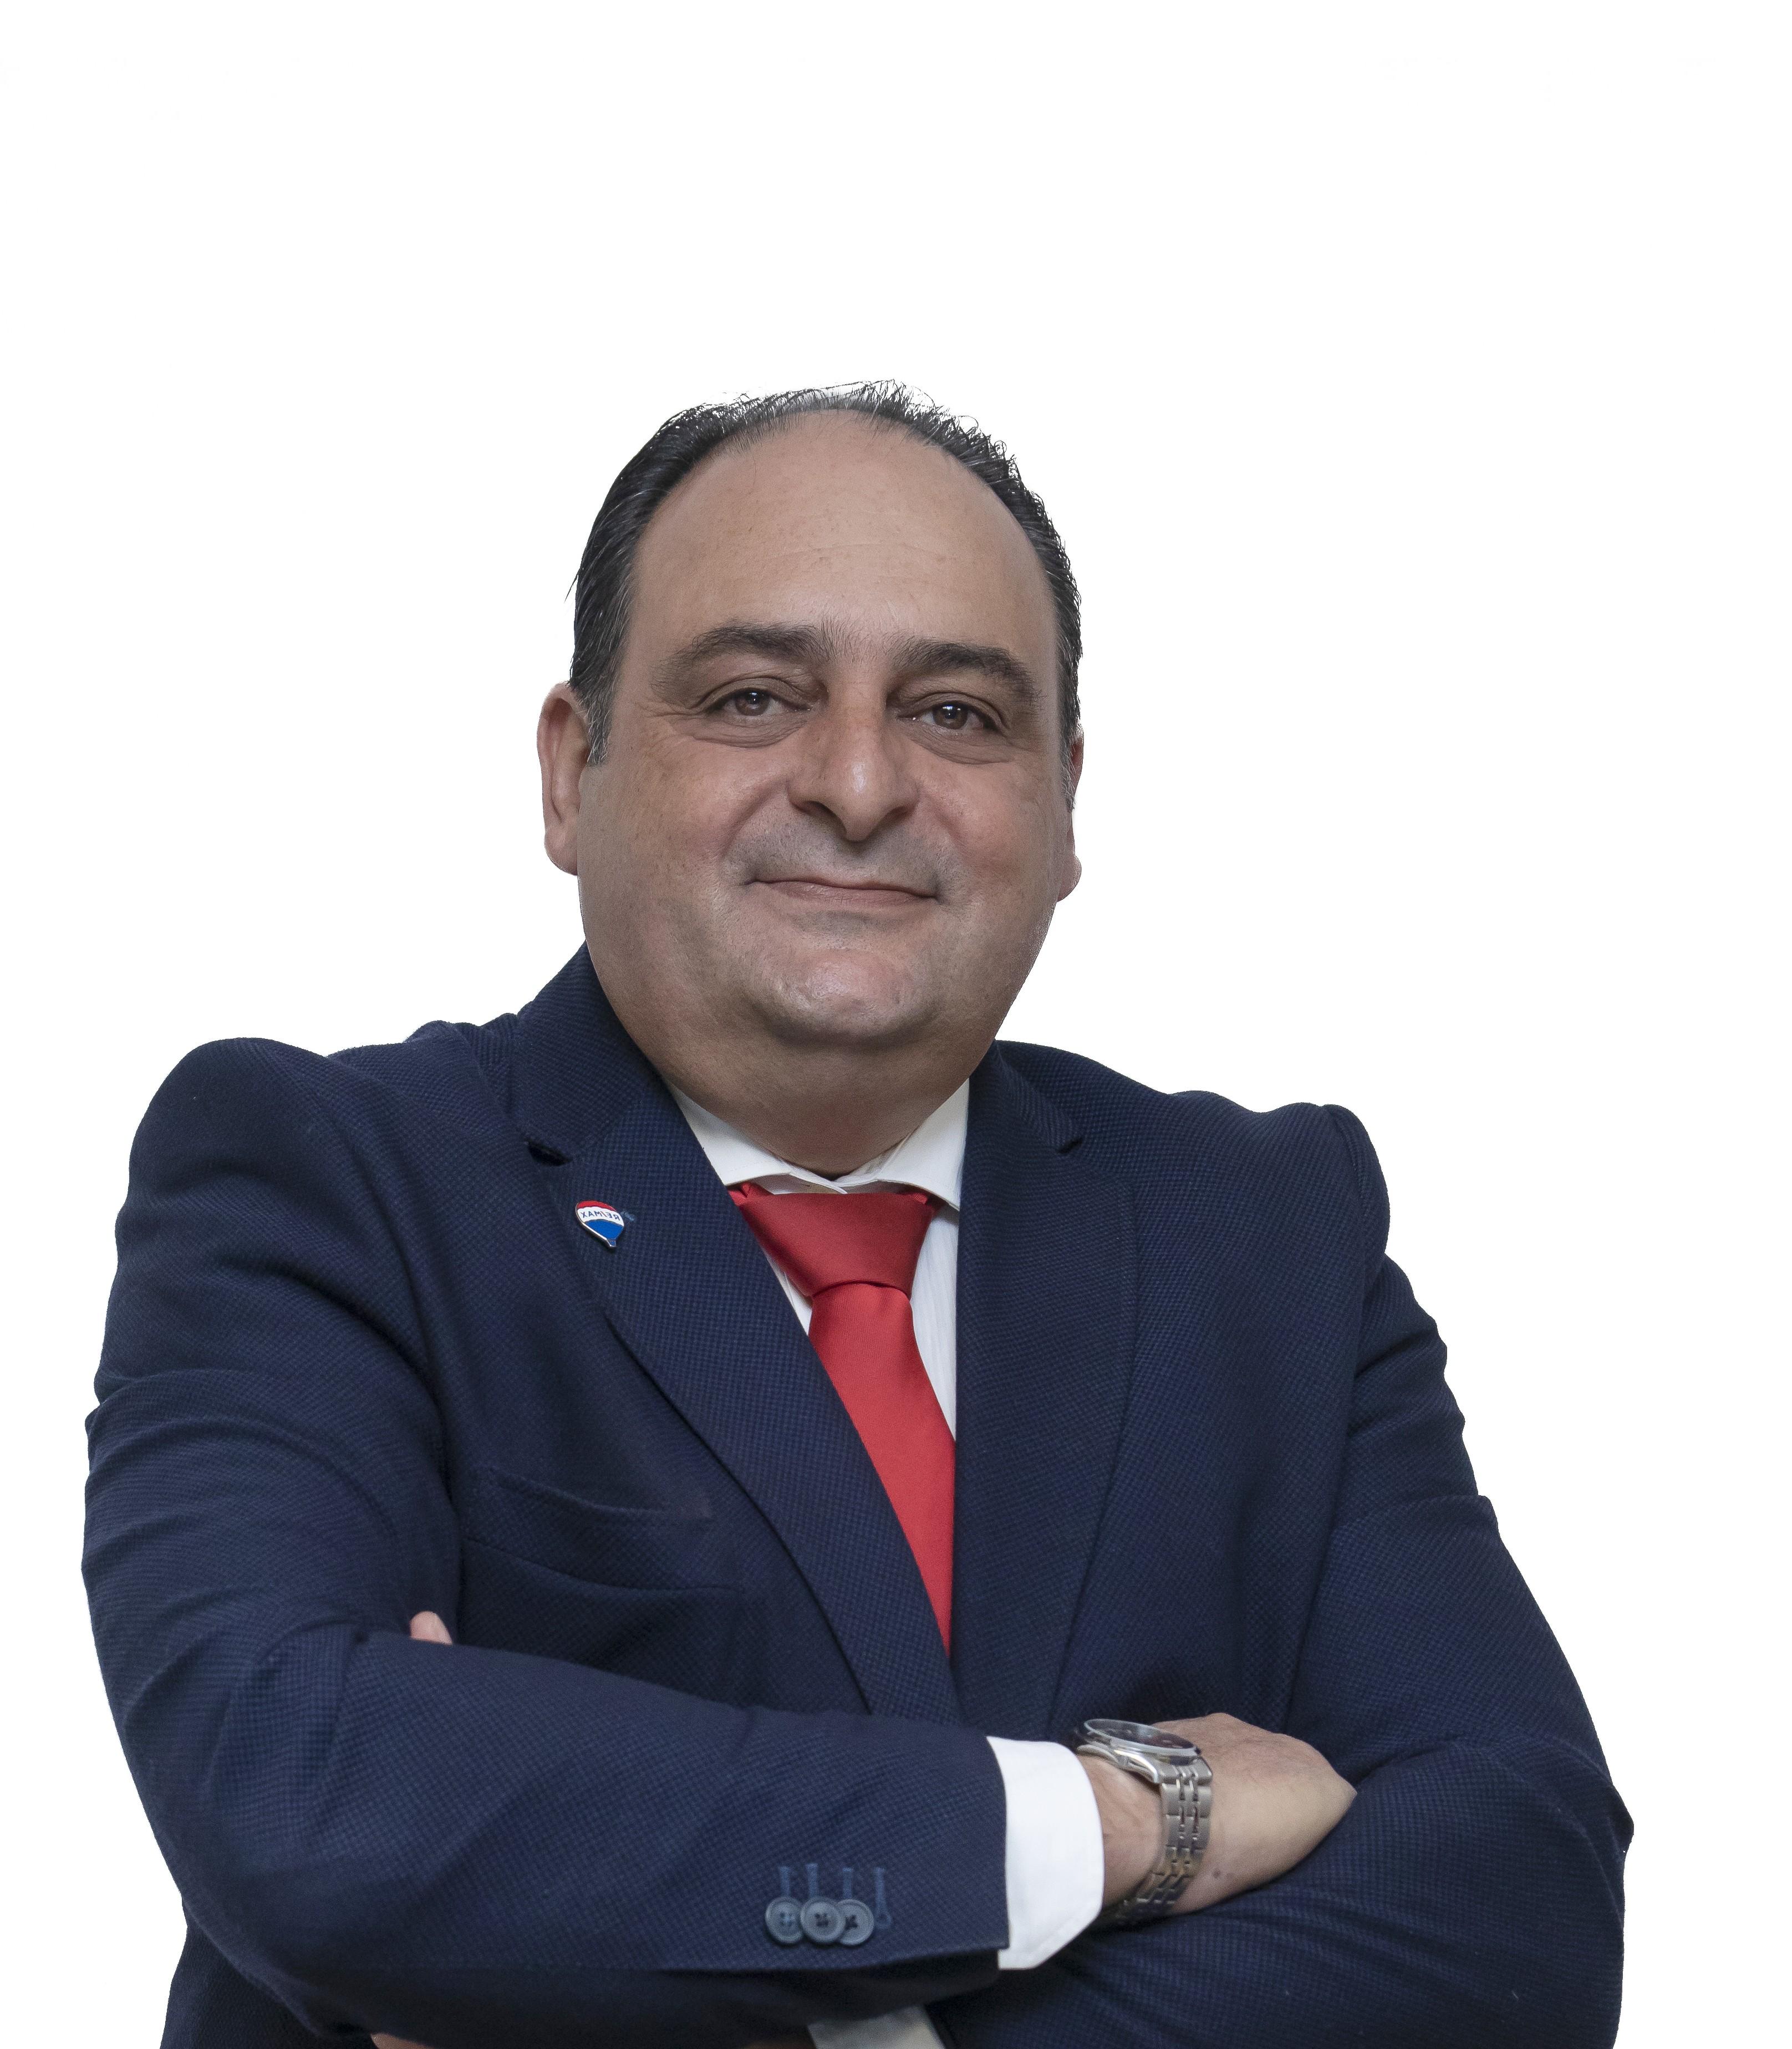 Antonio Bonilla Sabido